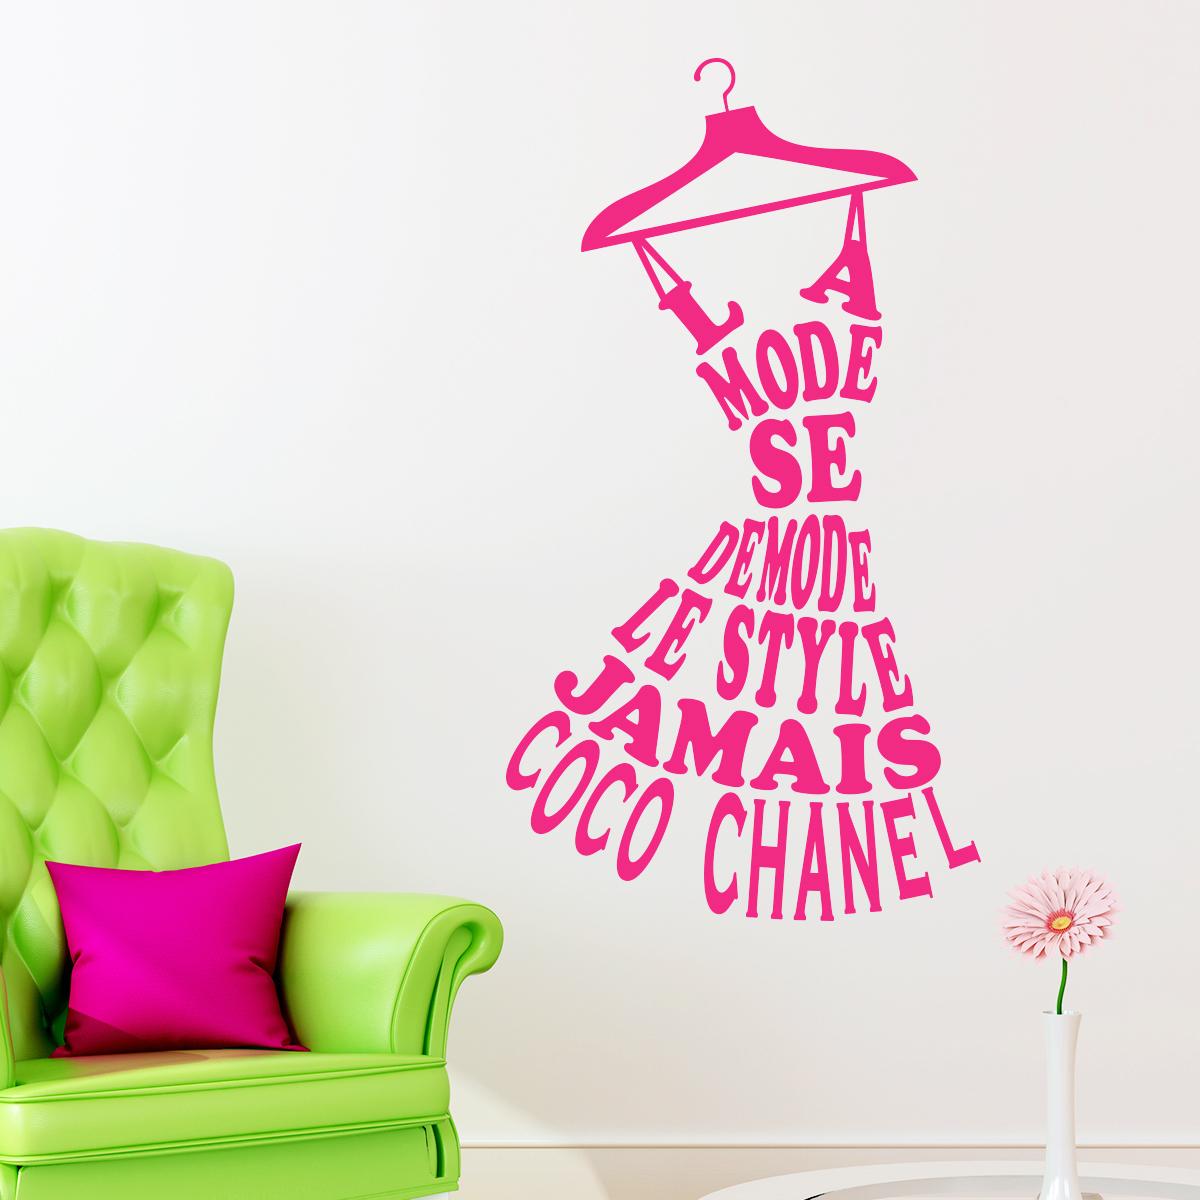 coco chanel stickers kamos sticker. Black Bedroom Furniture Sets. Home Design Ideas